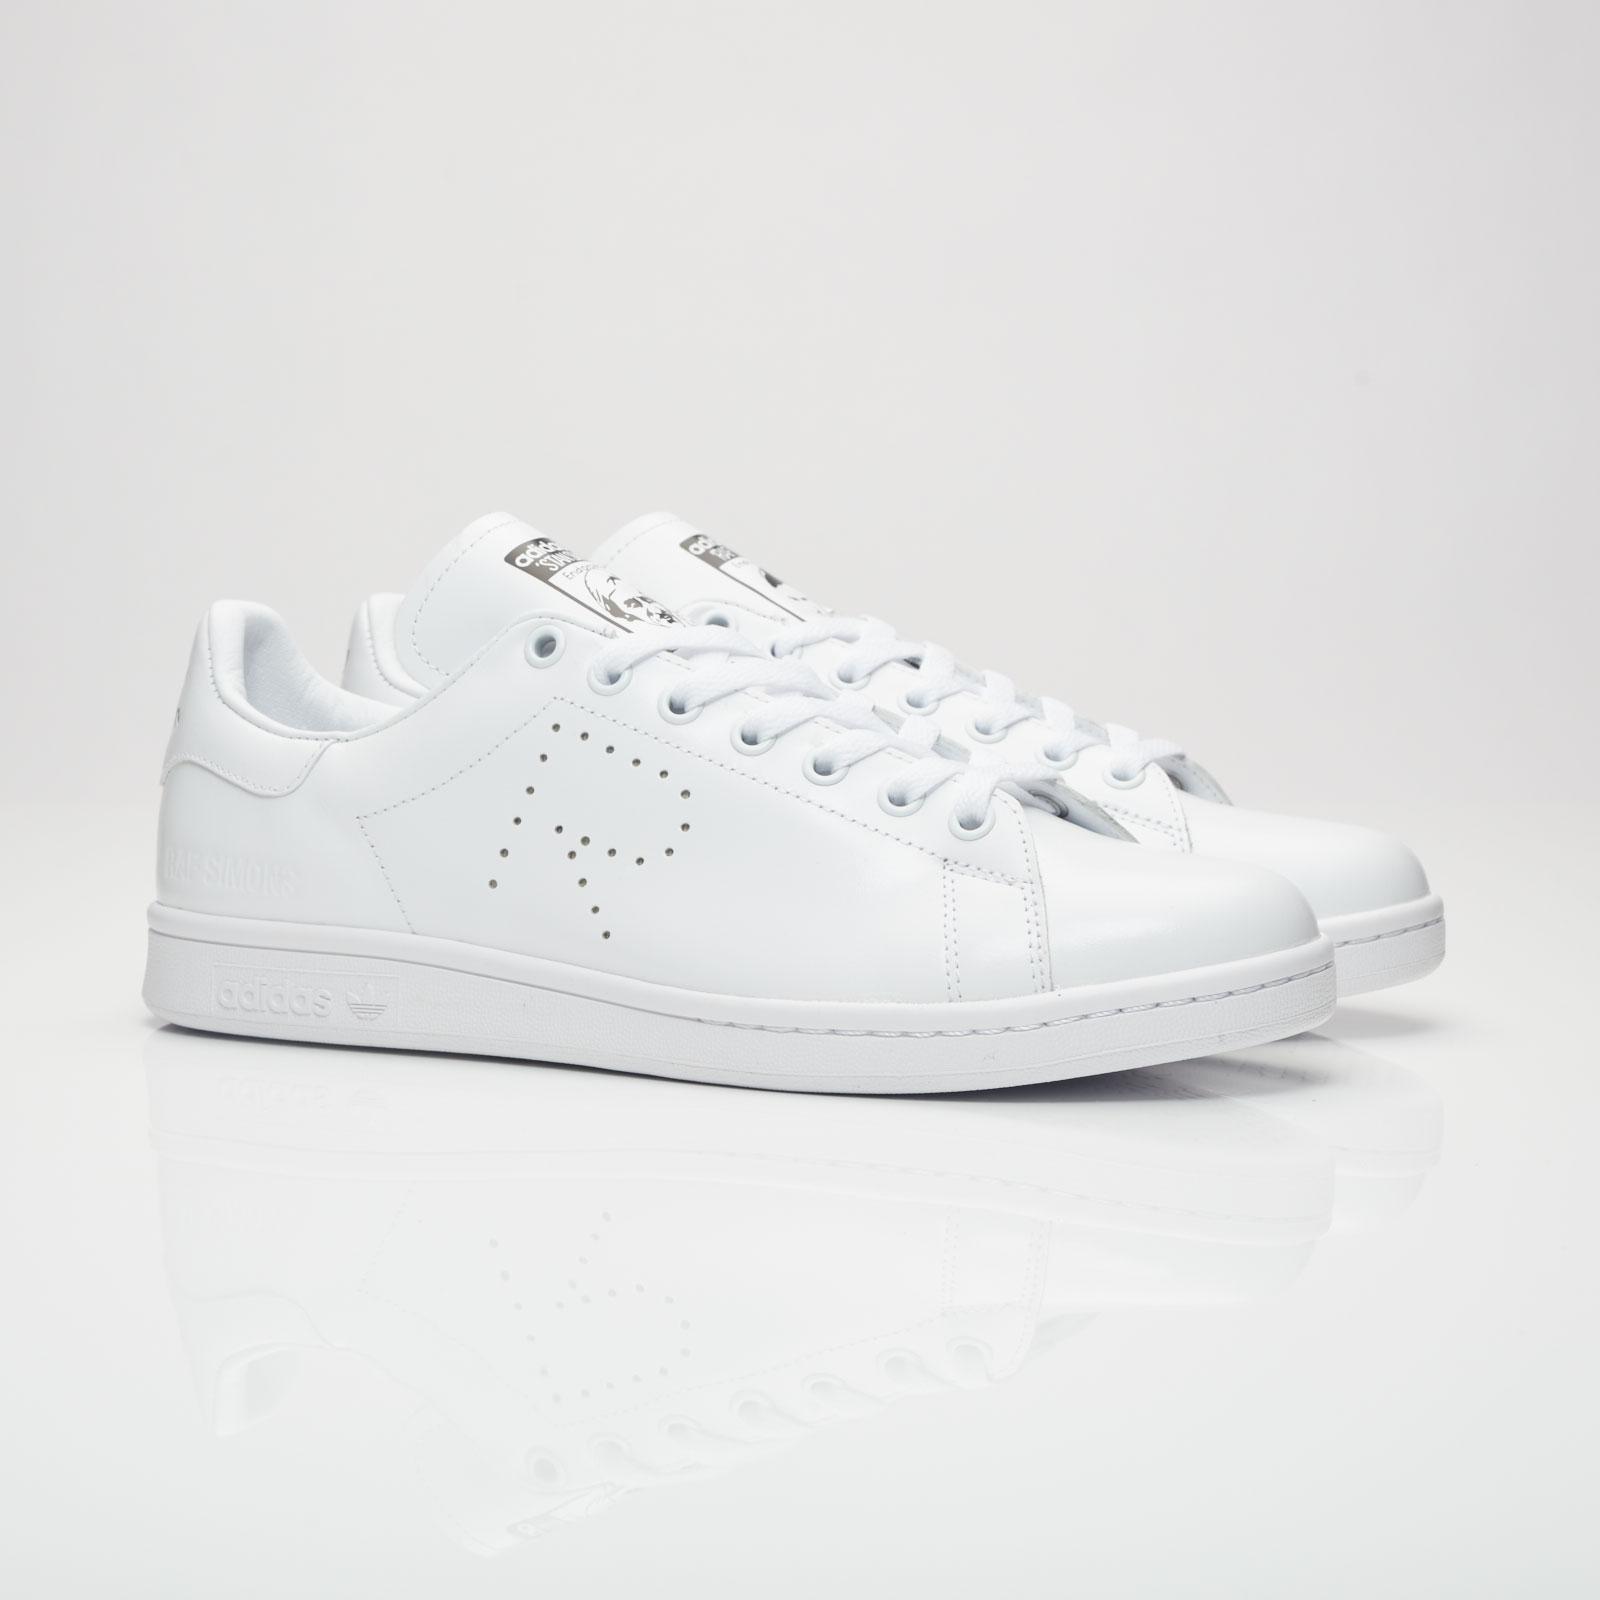 adidas Raf Simons Stan Smith S81167 Sneakersnstuff I